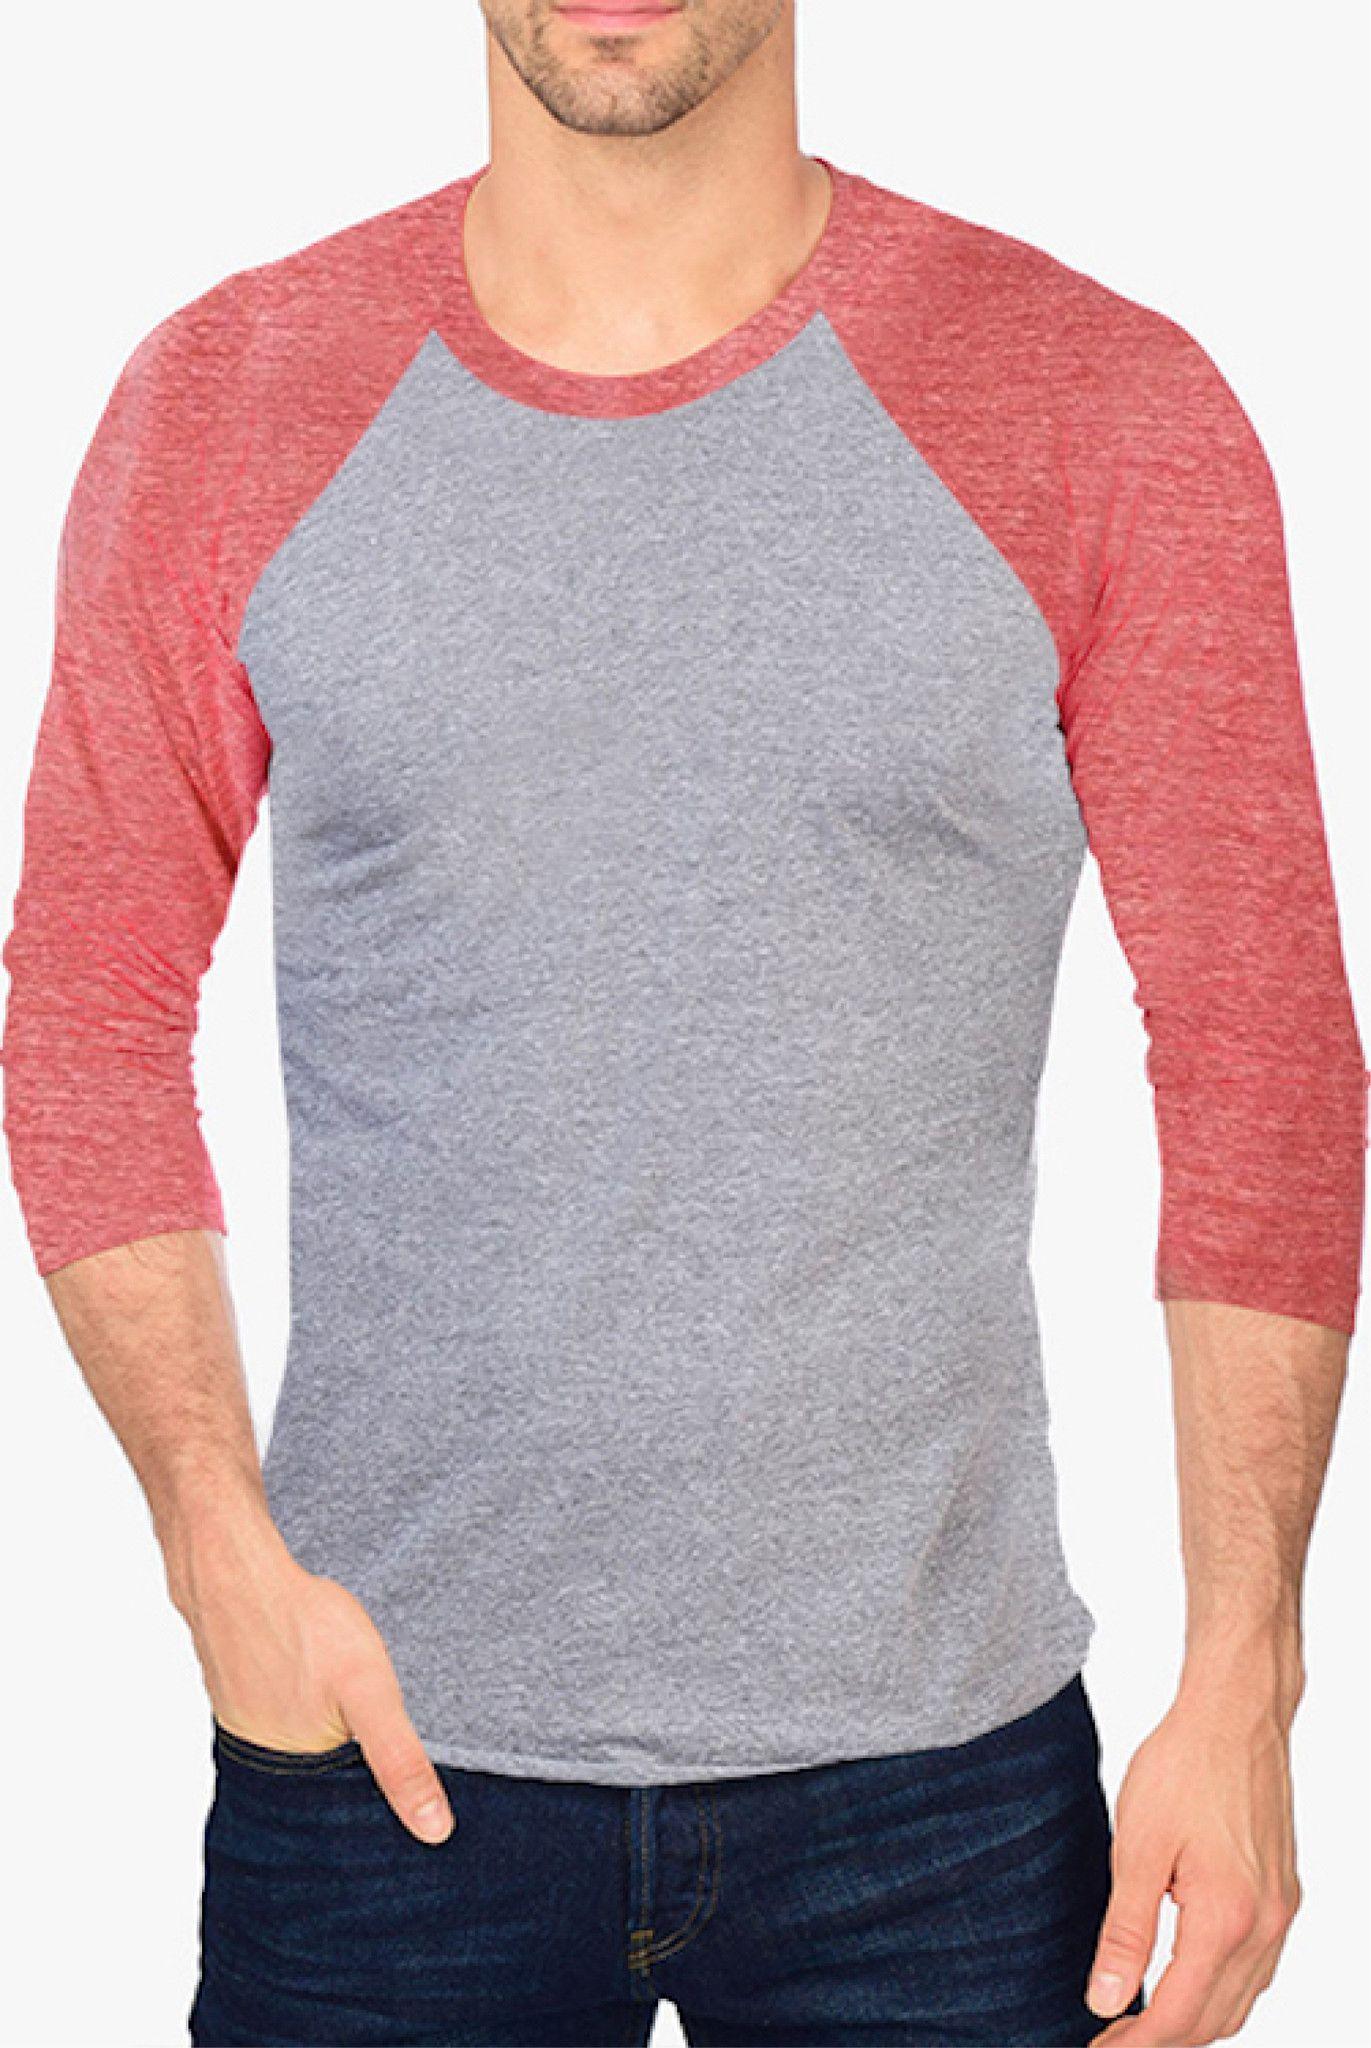 Men's Tri-Blend Raglan shirt with 3/4 Sleeve